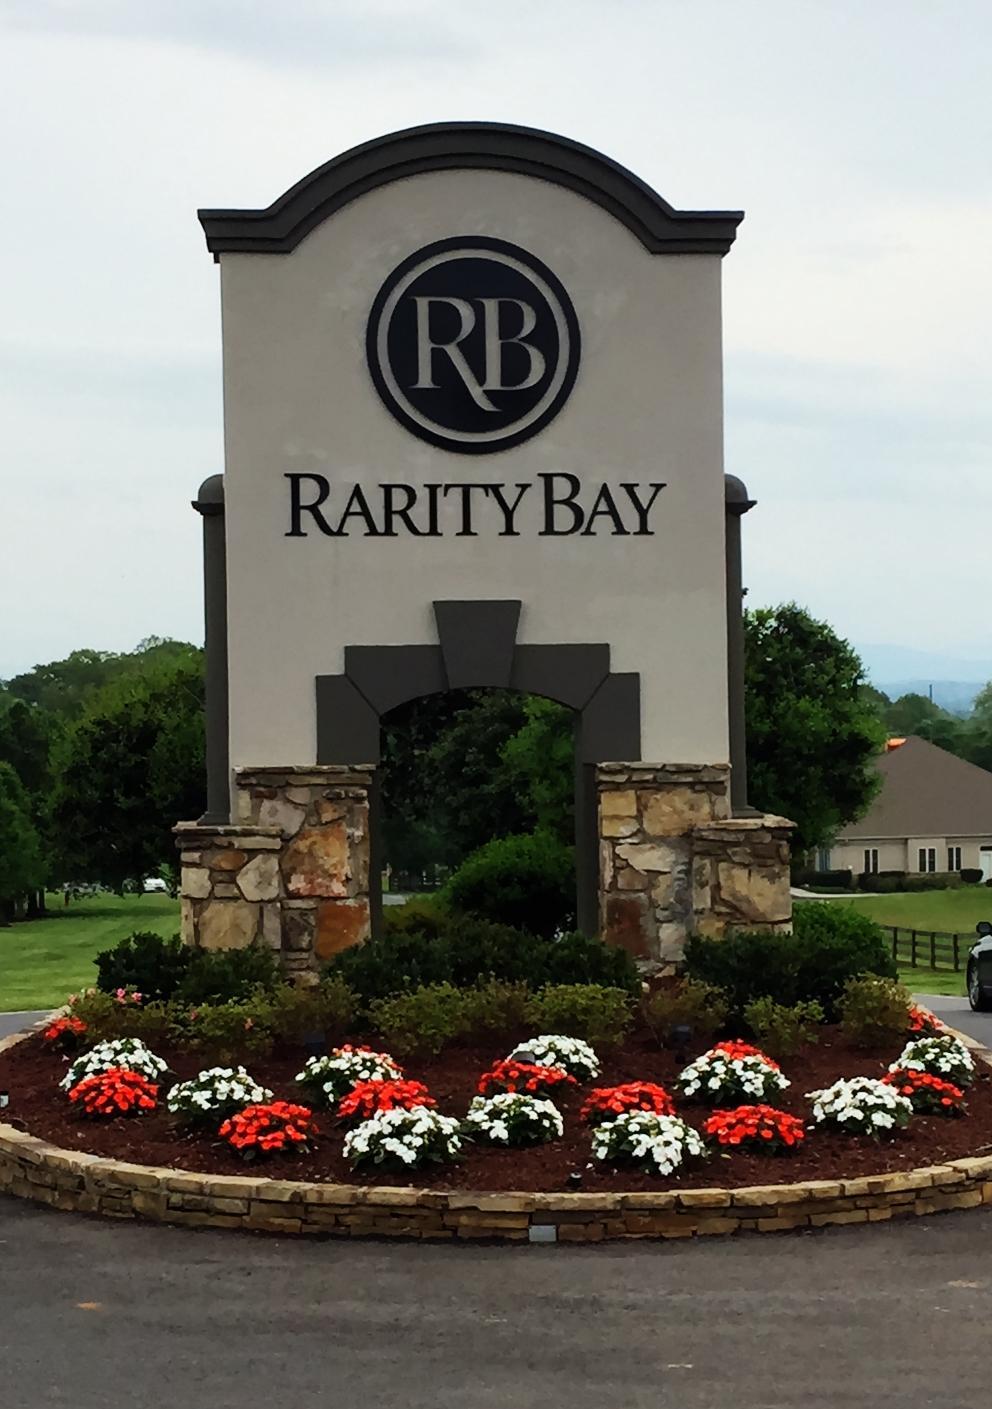 660 Rarity Bay Pkwy: